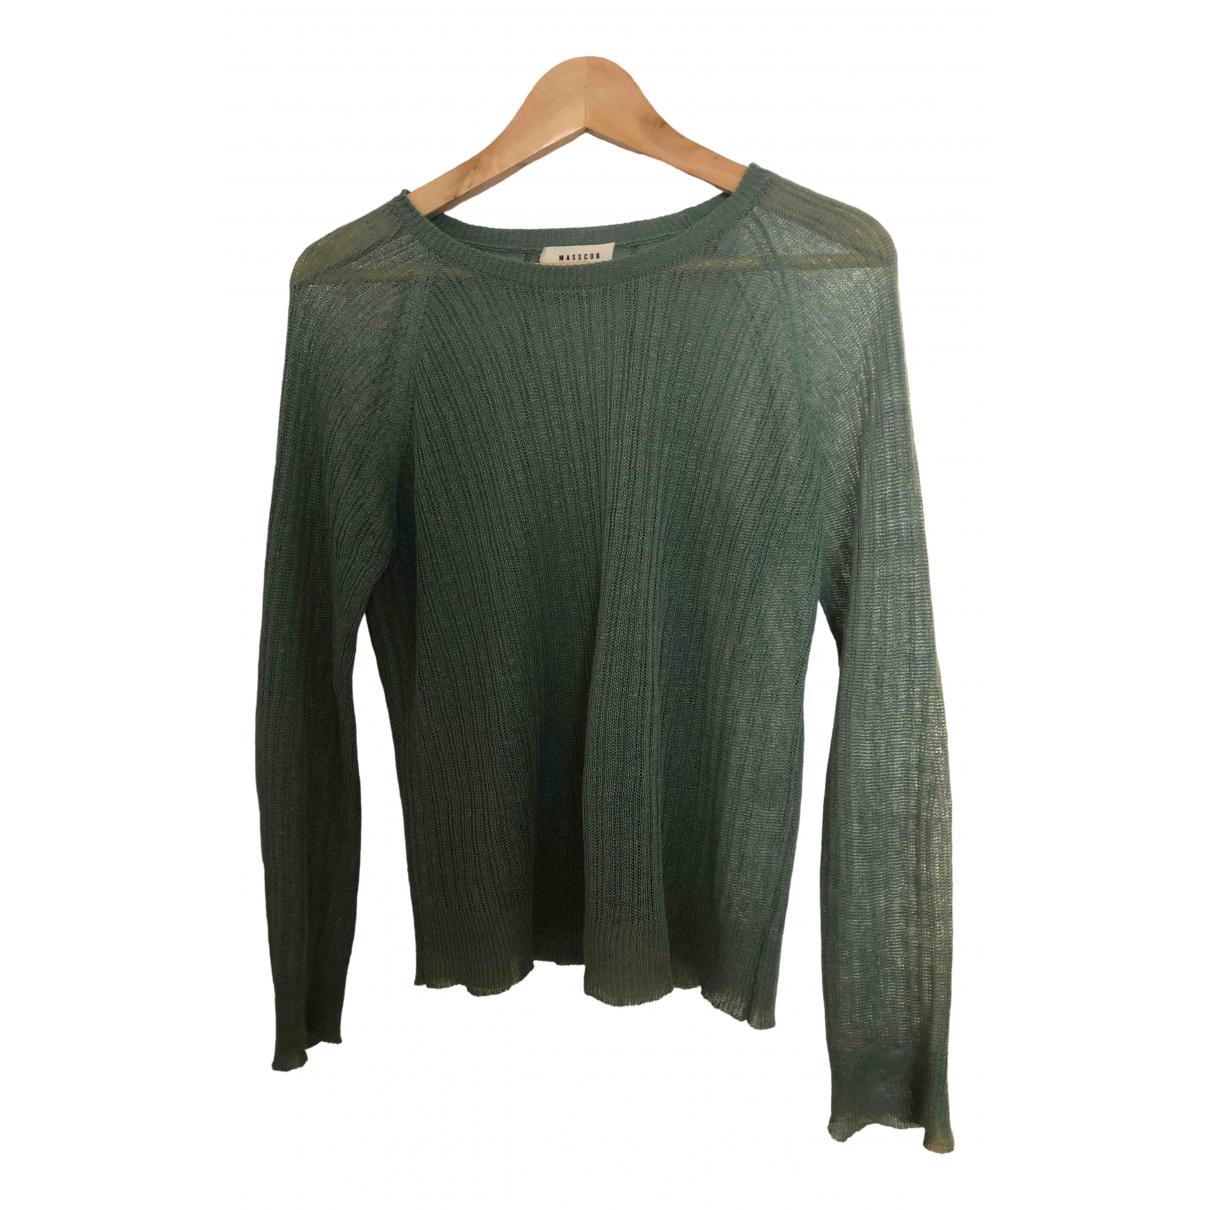 Masscob \N Green Linen Knitwear for Women M International